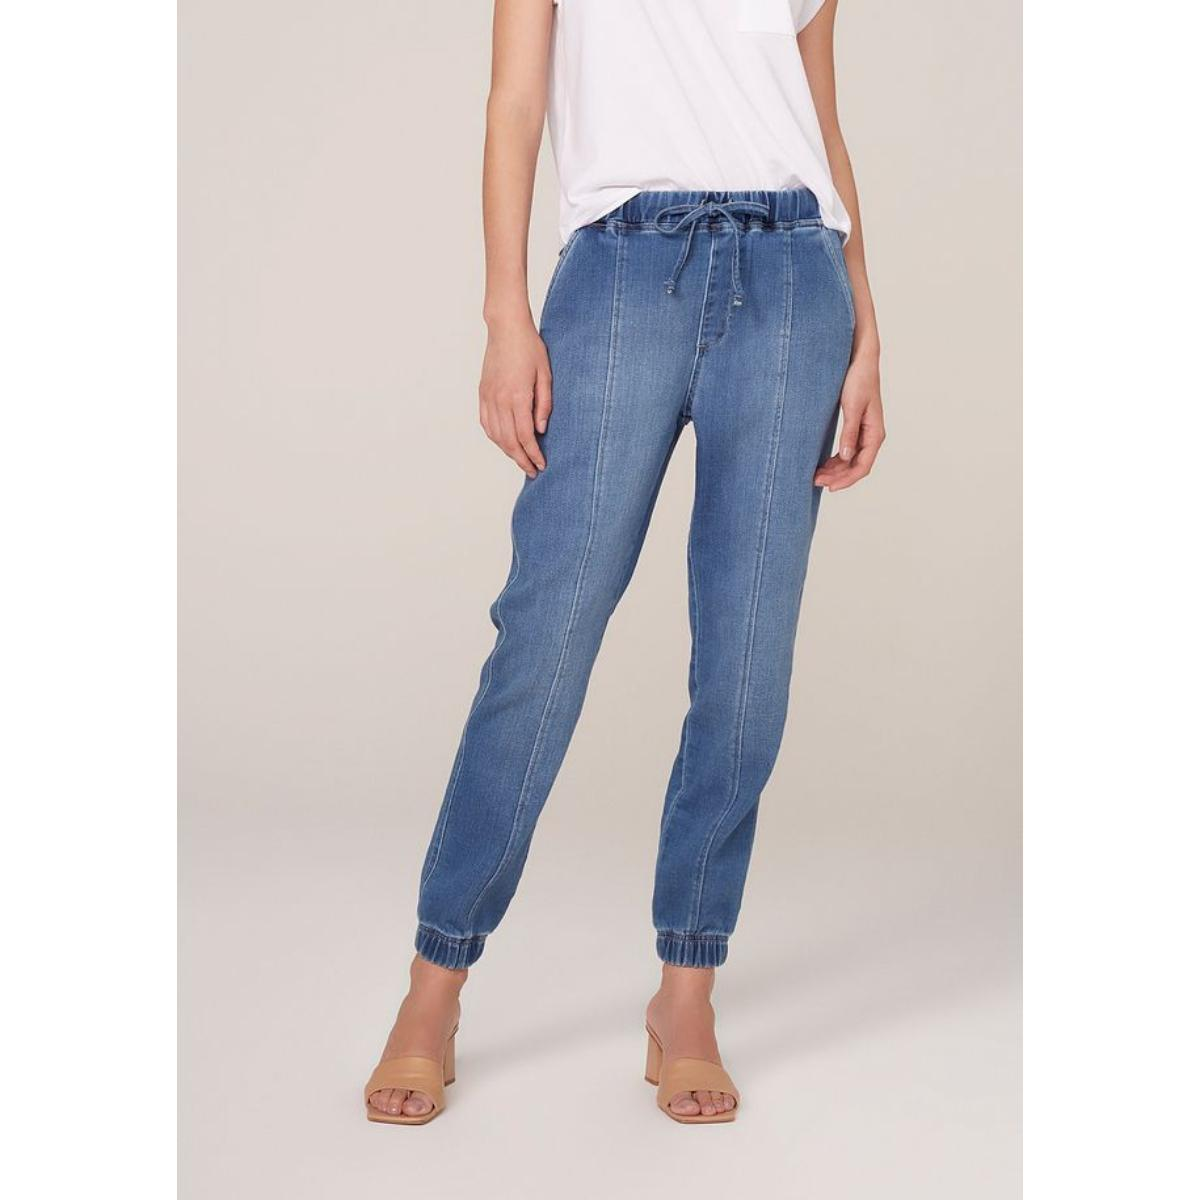 Calça Feminina Dzarm Zu5p 1bsn Jeans Claro